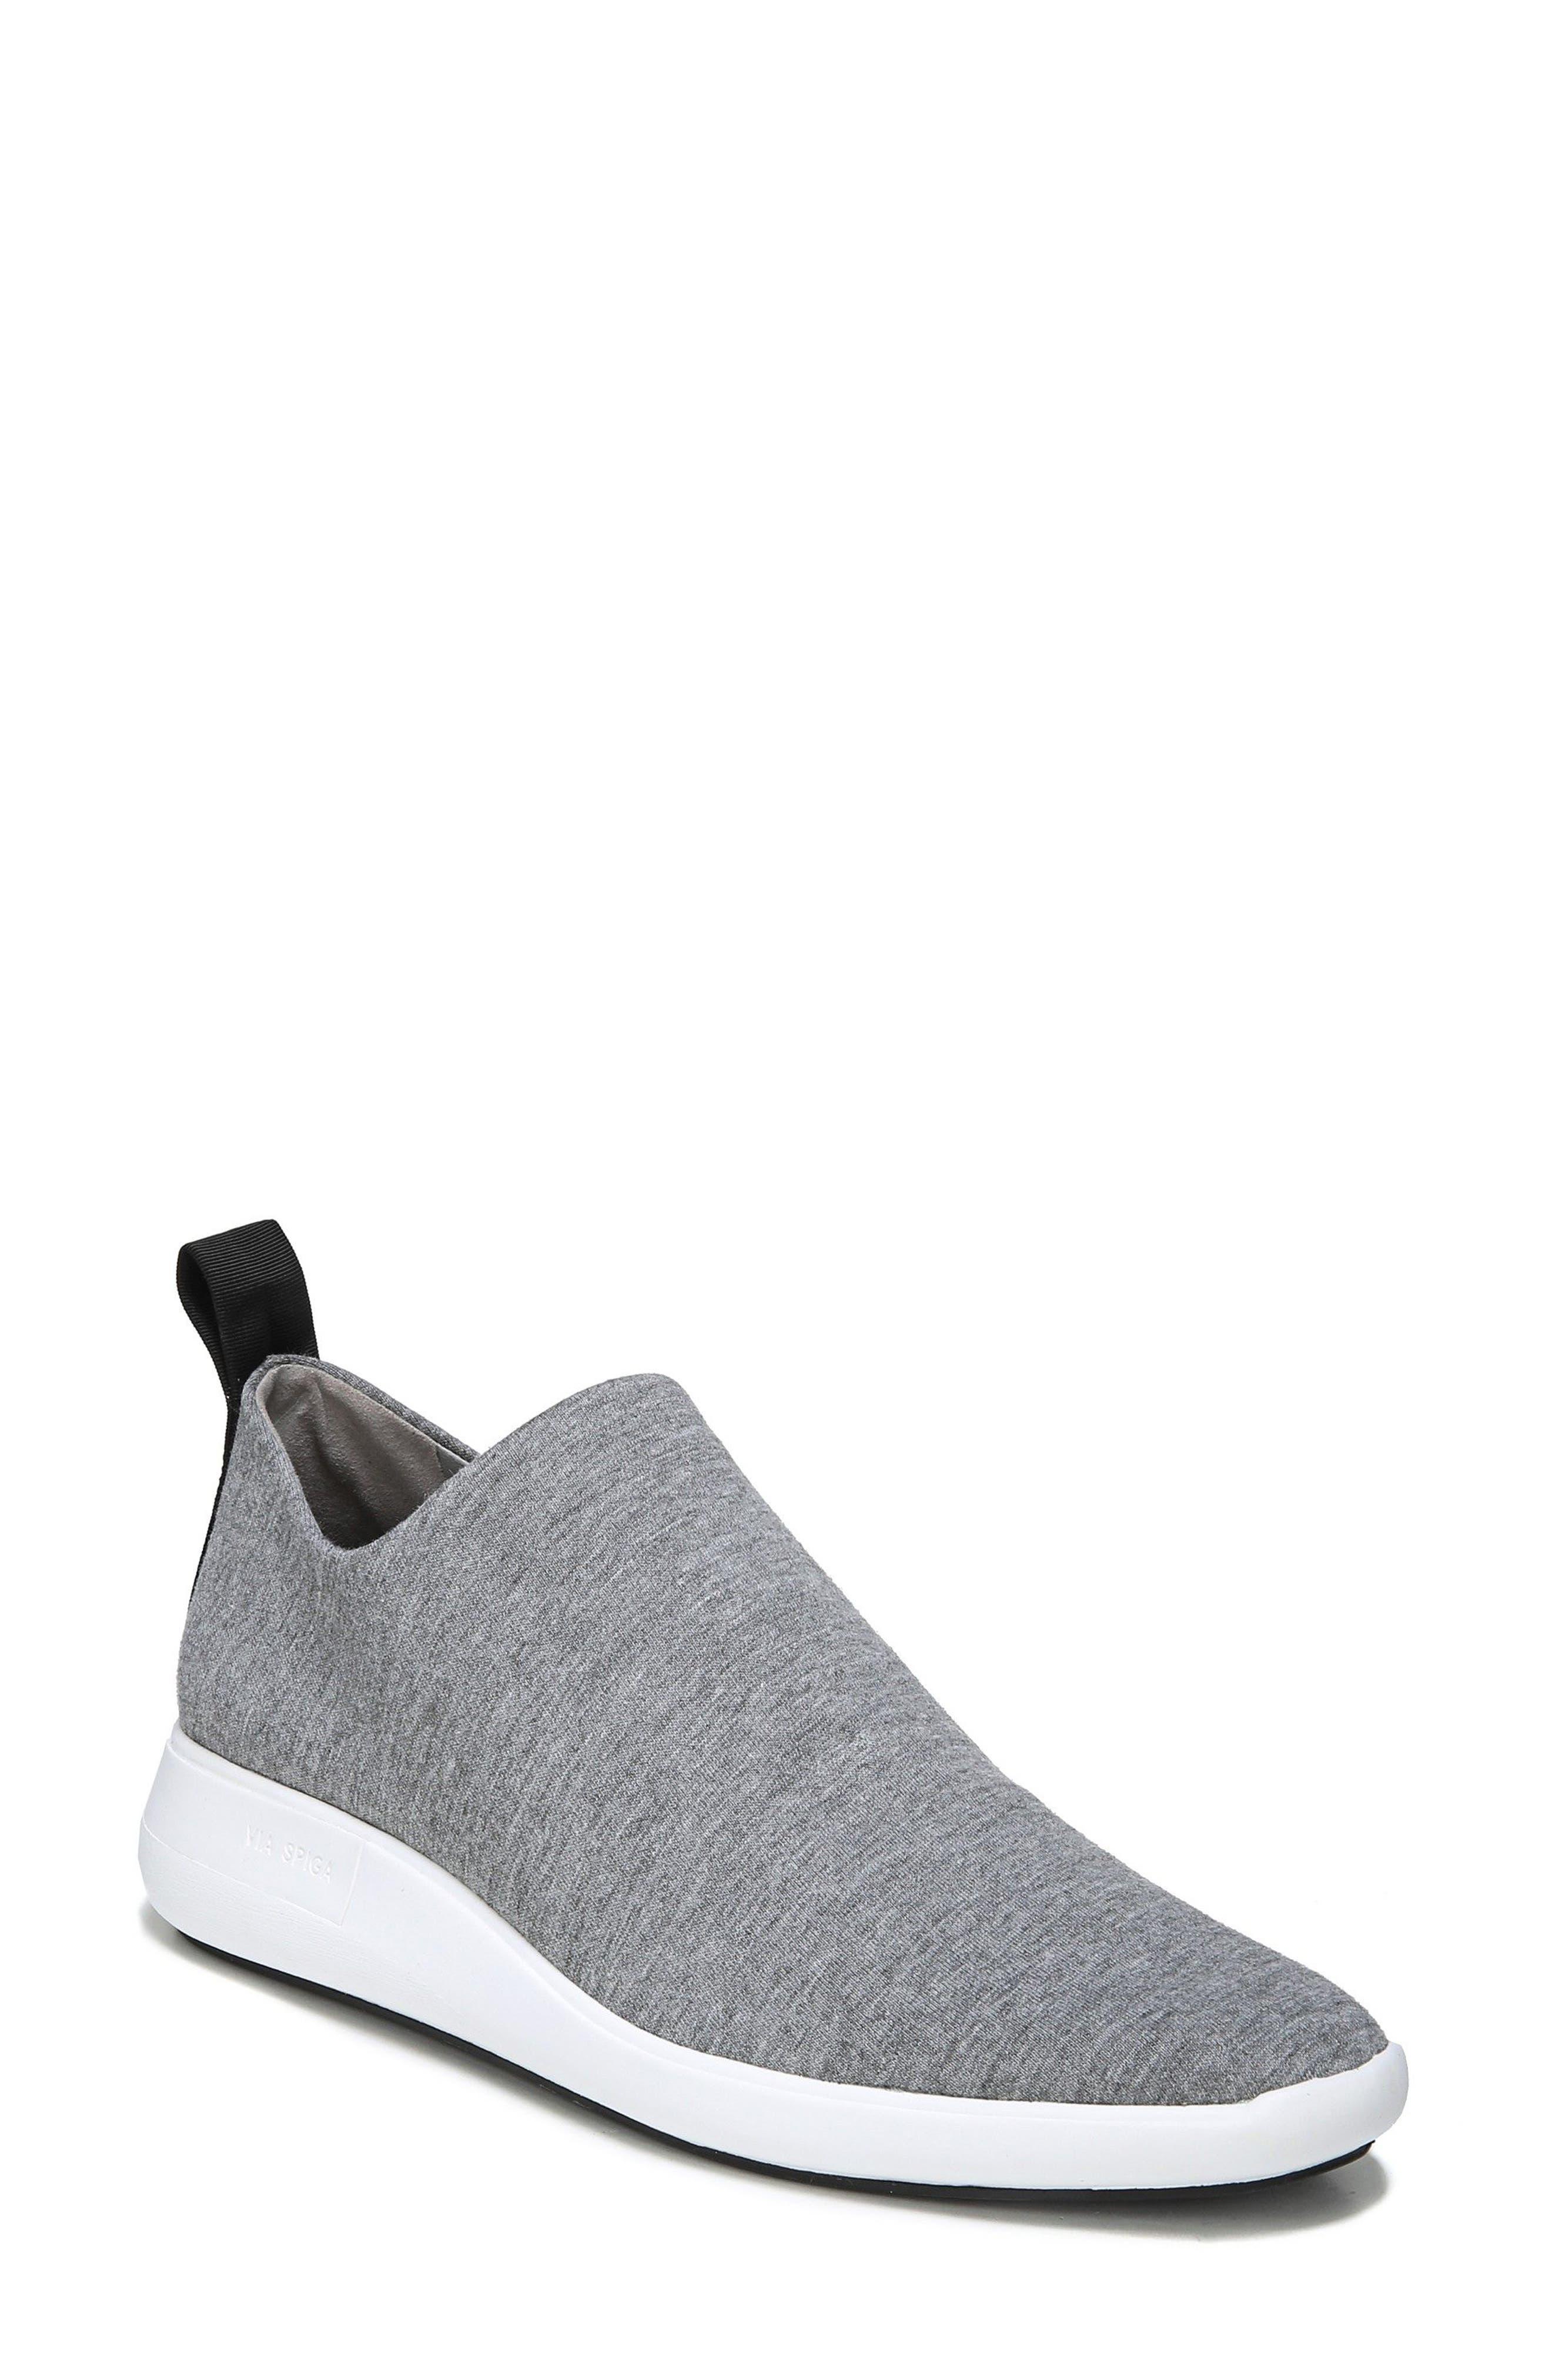 Marlow Slip-On Sneaker,                         Main,                         color,